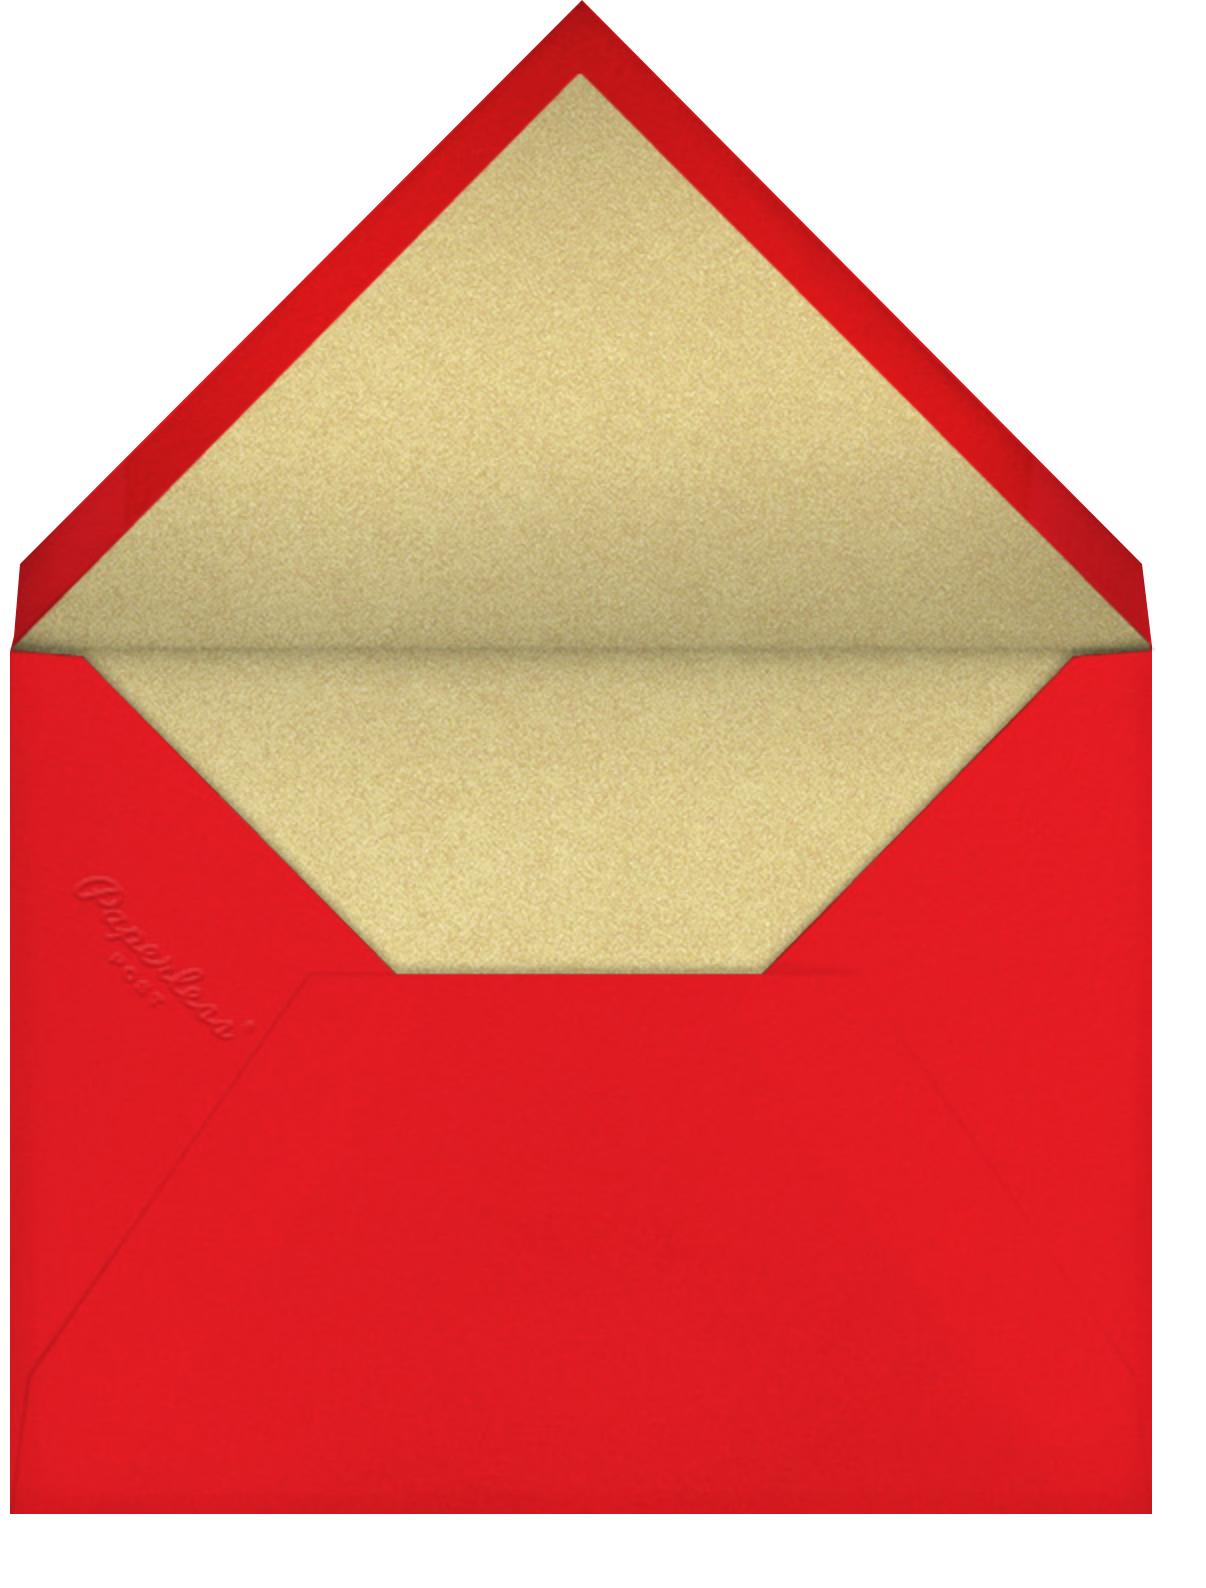 Red Pocket Fortune - Paperless Post - Envelope